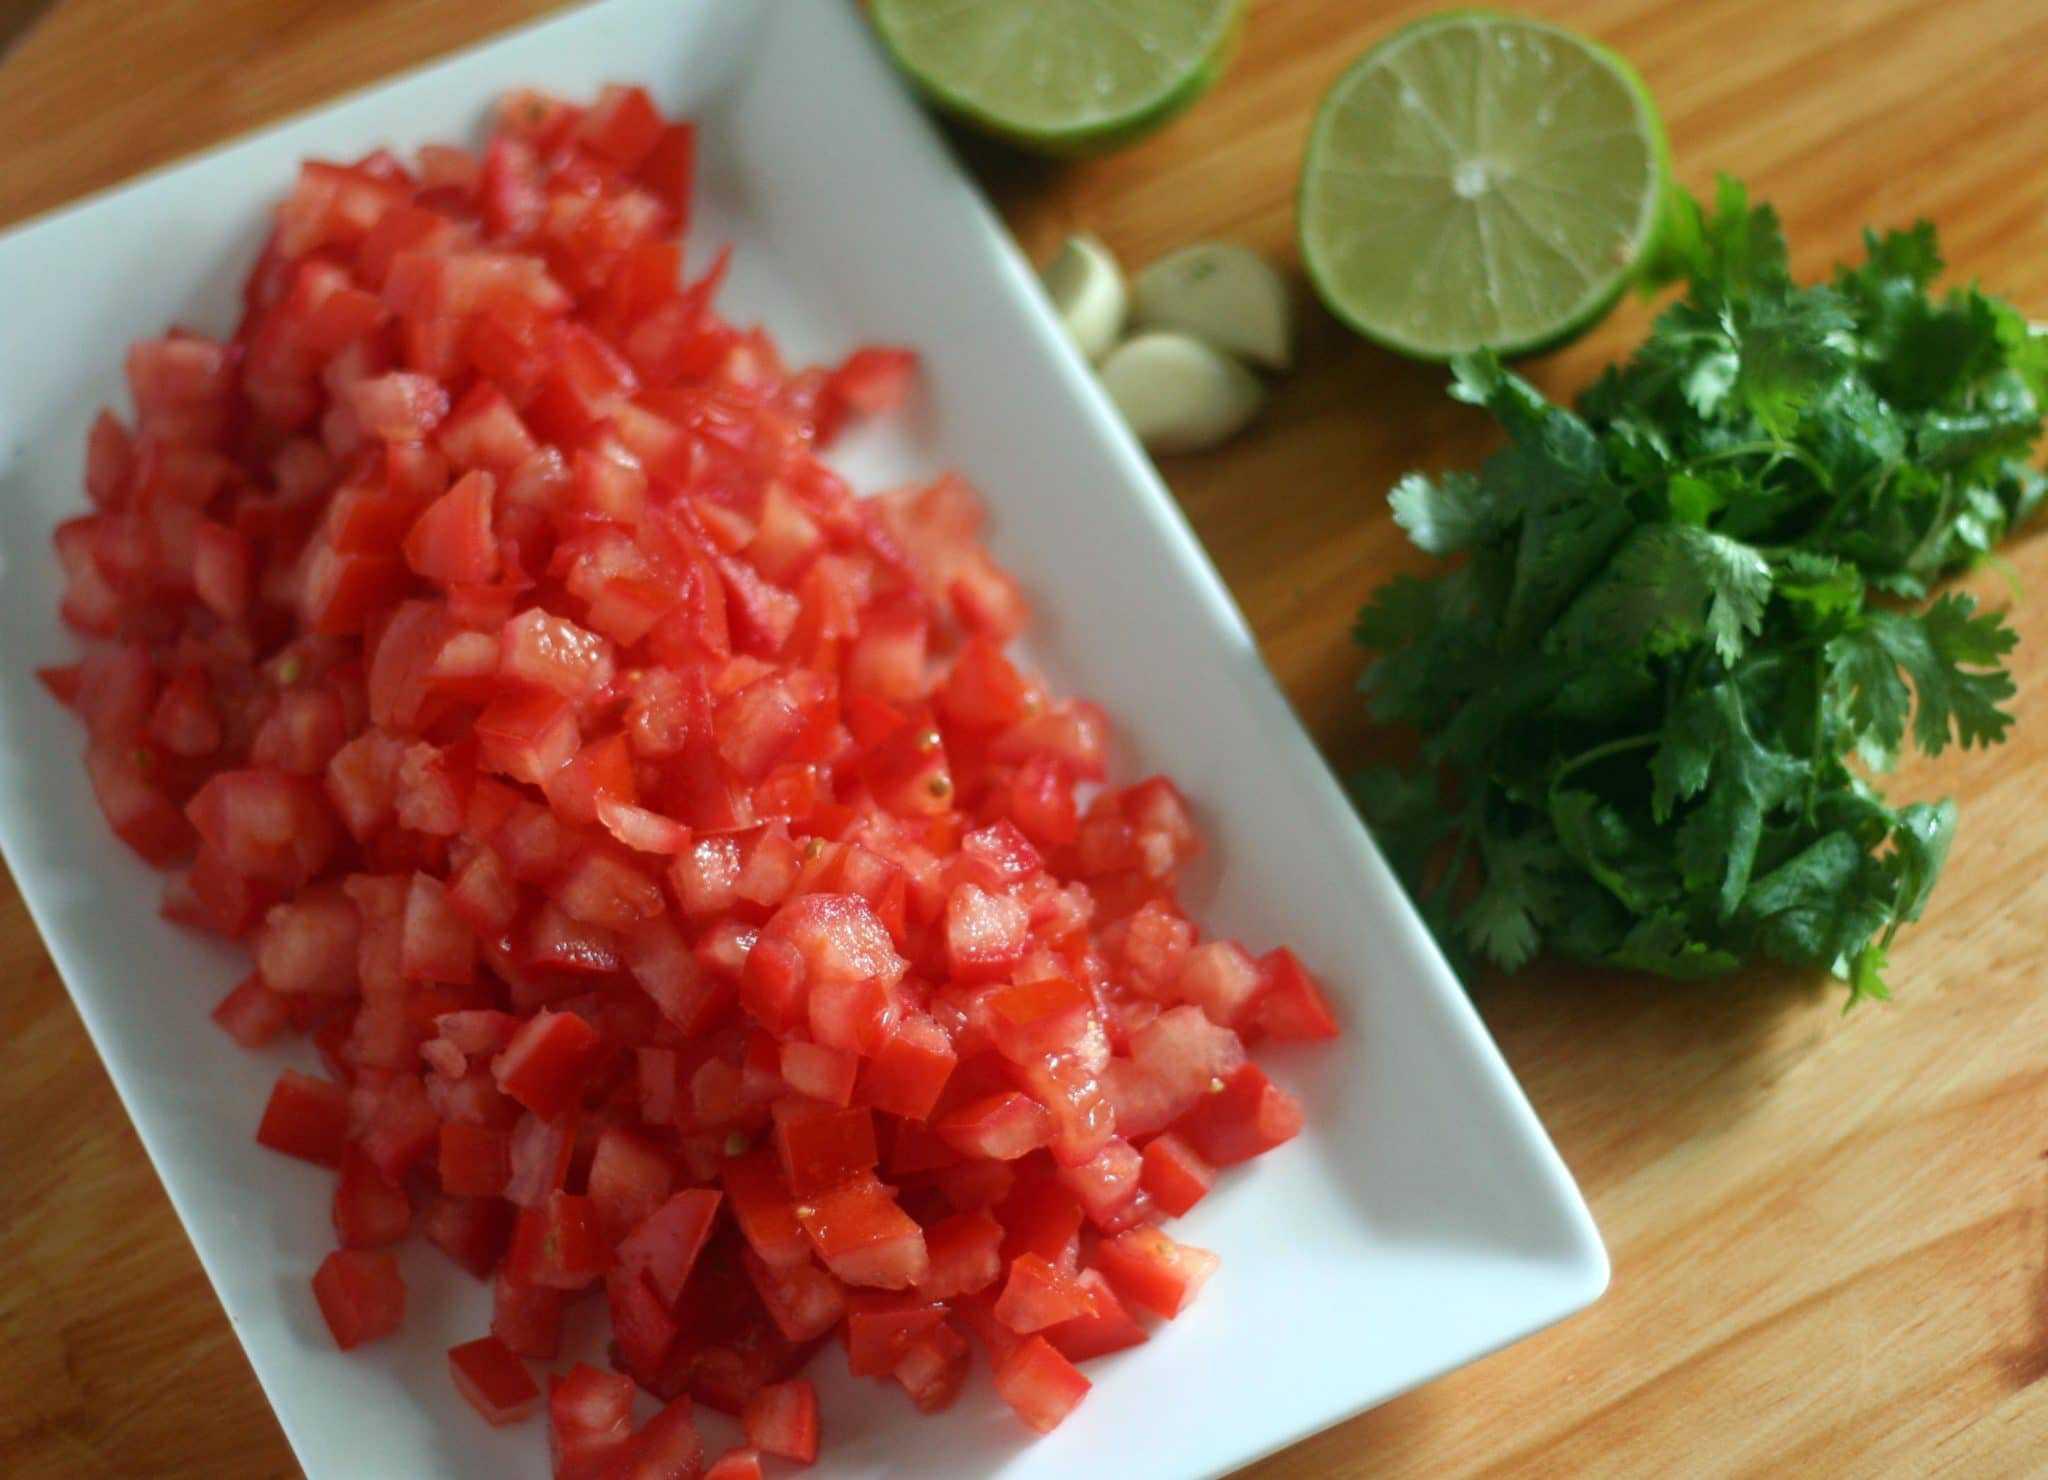 fresh tomatoes, limes, garlic, and fresh cilantro on a platter to make authentic pico de gallo